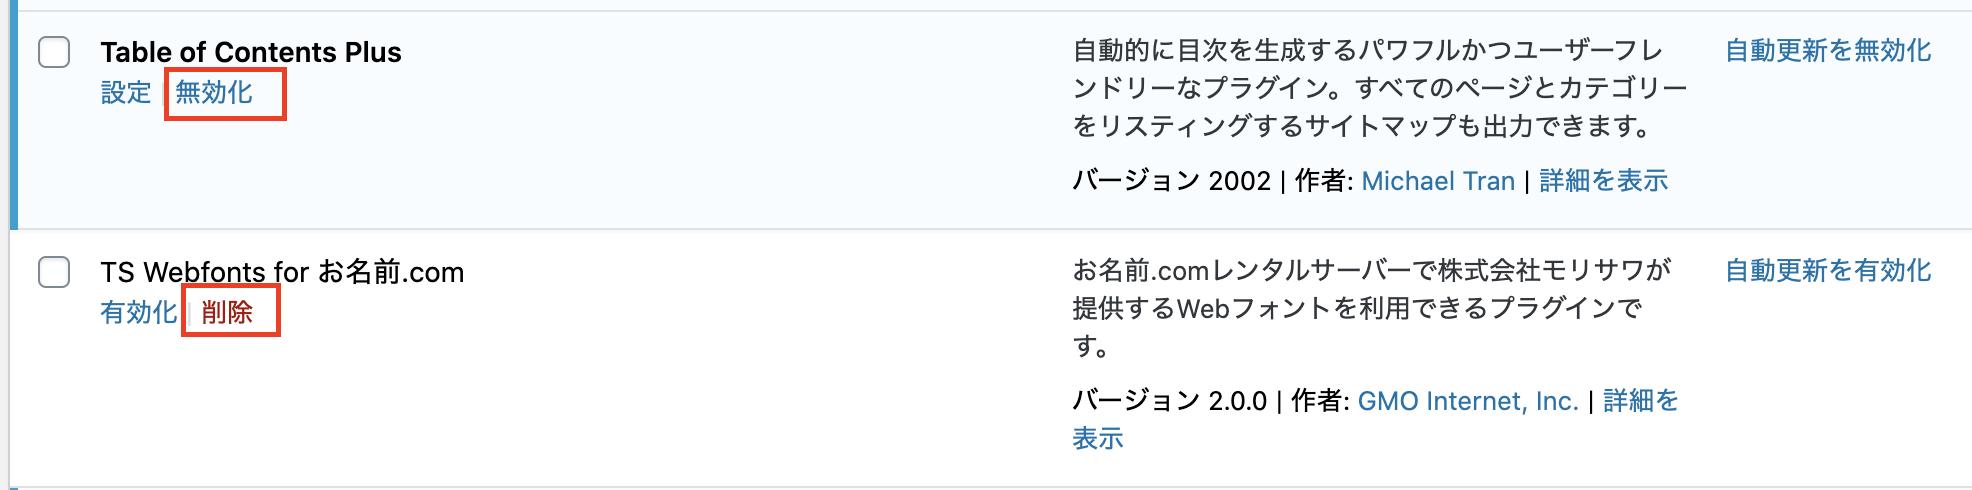 WordPressプラグインをインストール・停止・削除・更新